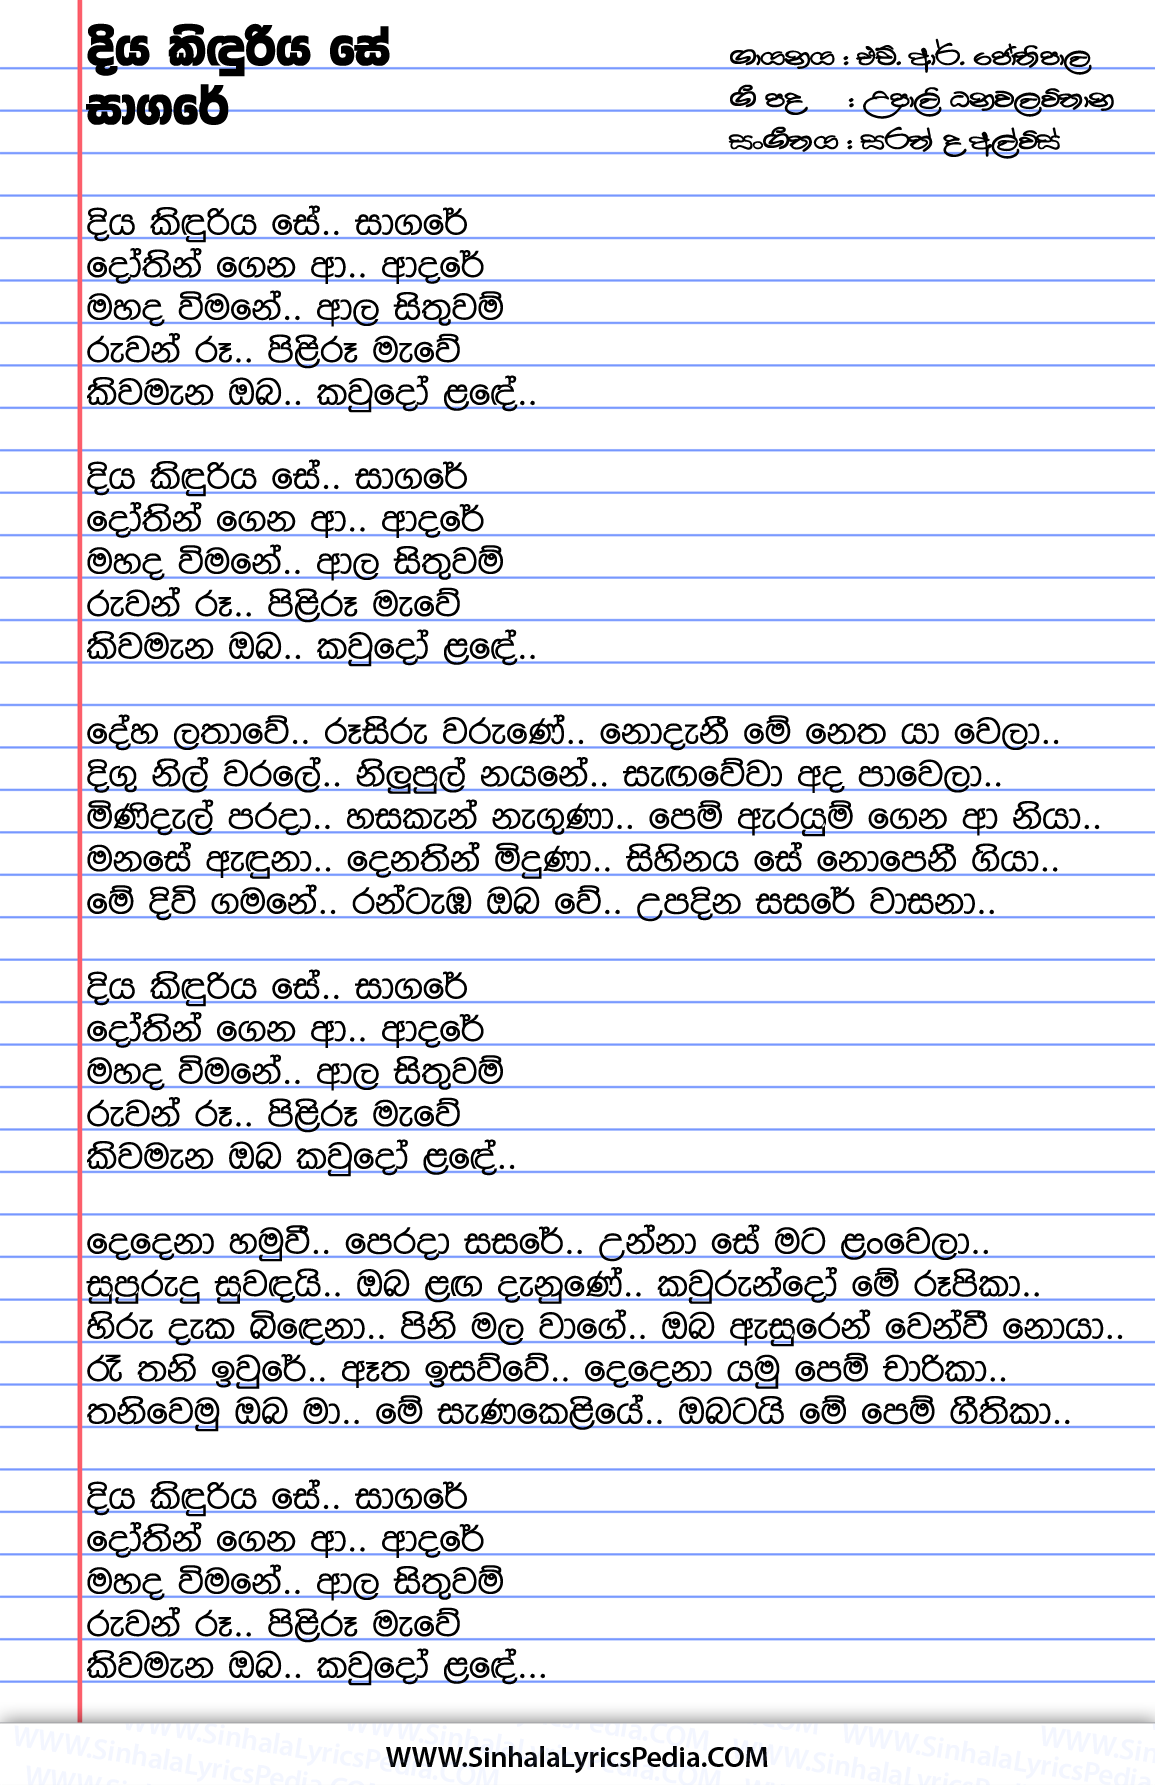 Diya Kinduriya Se Sagare Dothin Gena Aa Adare Song Lyrics